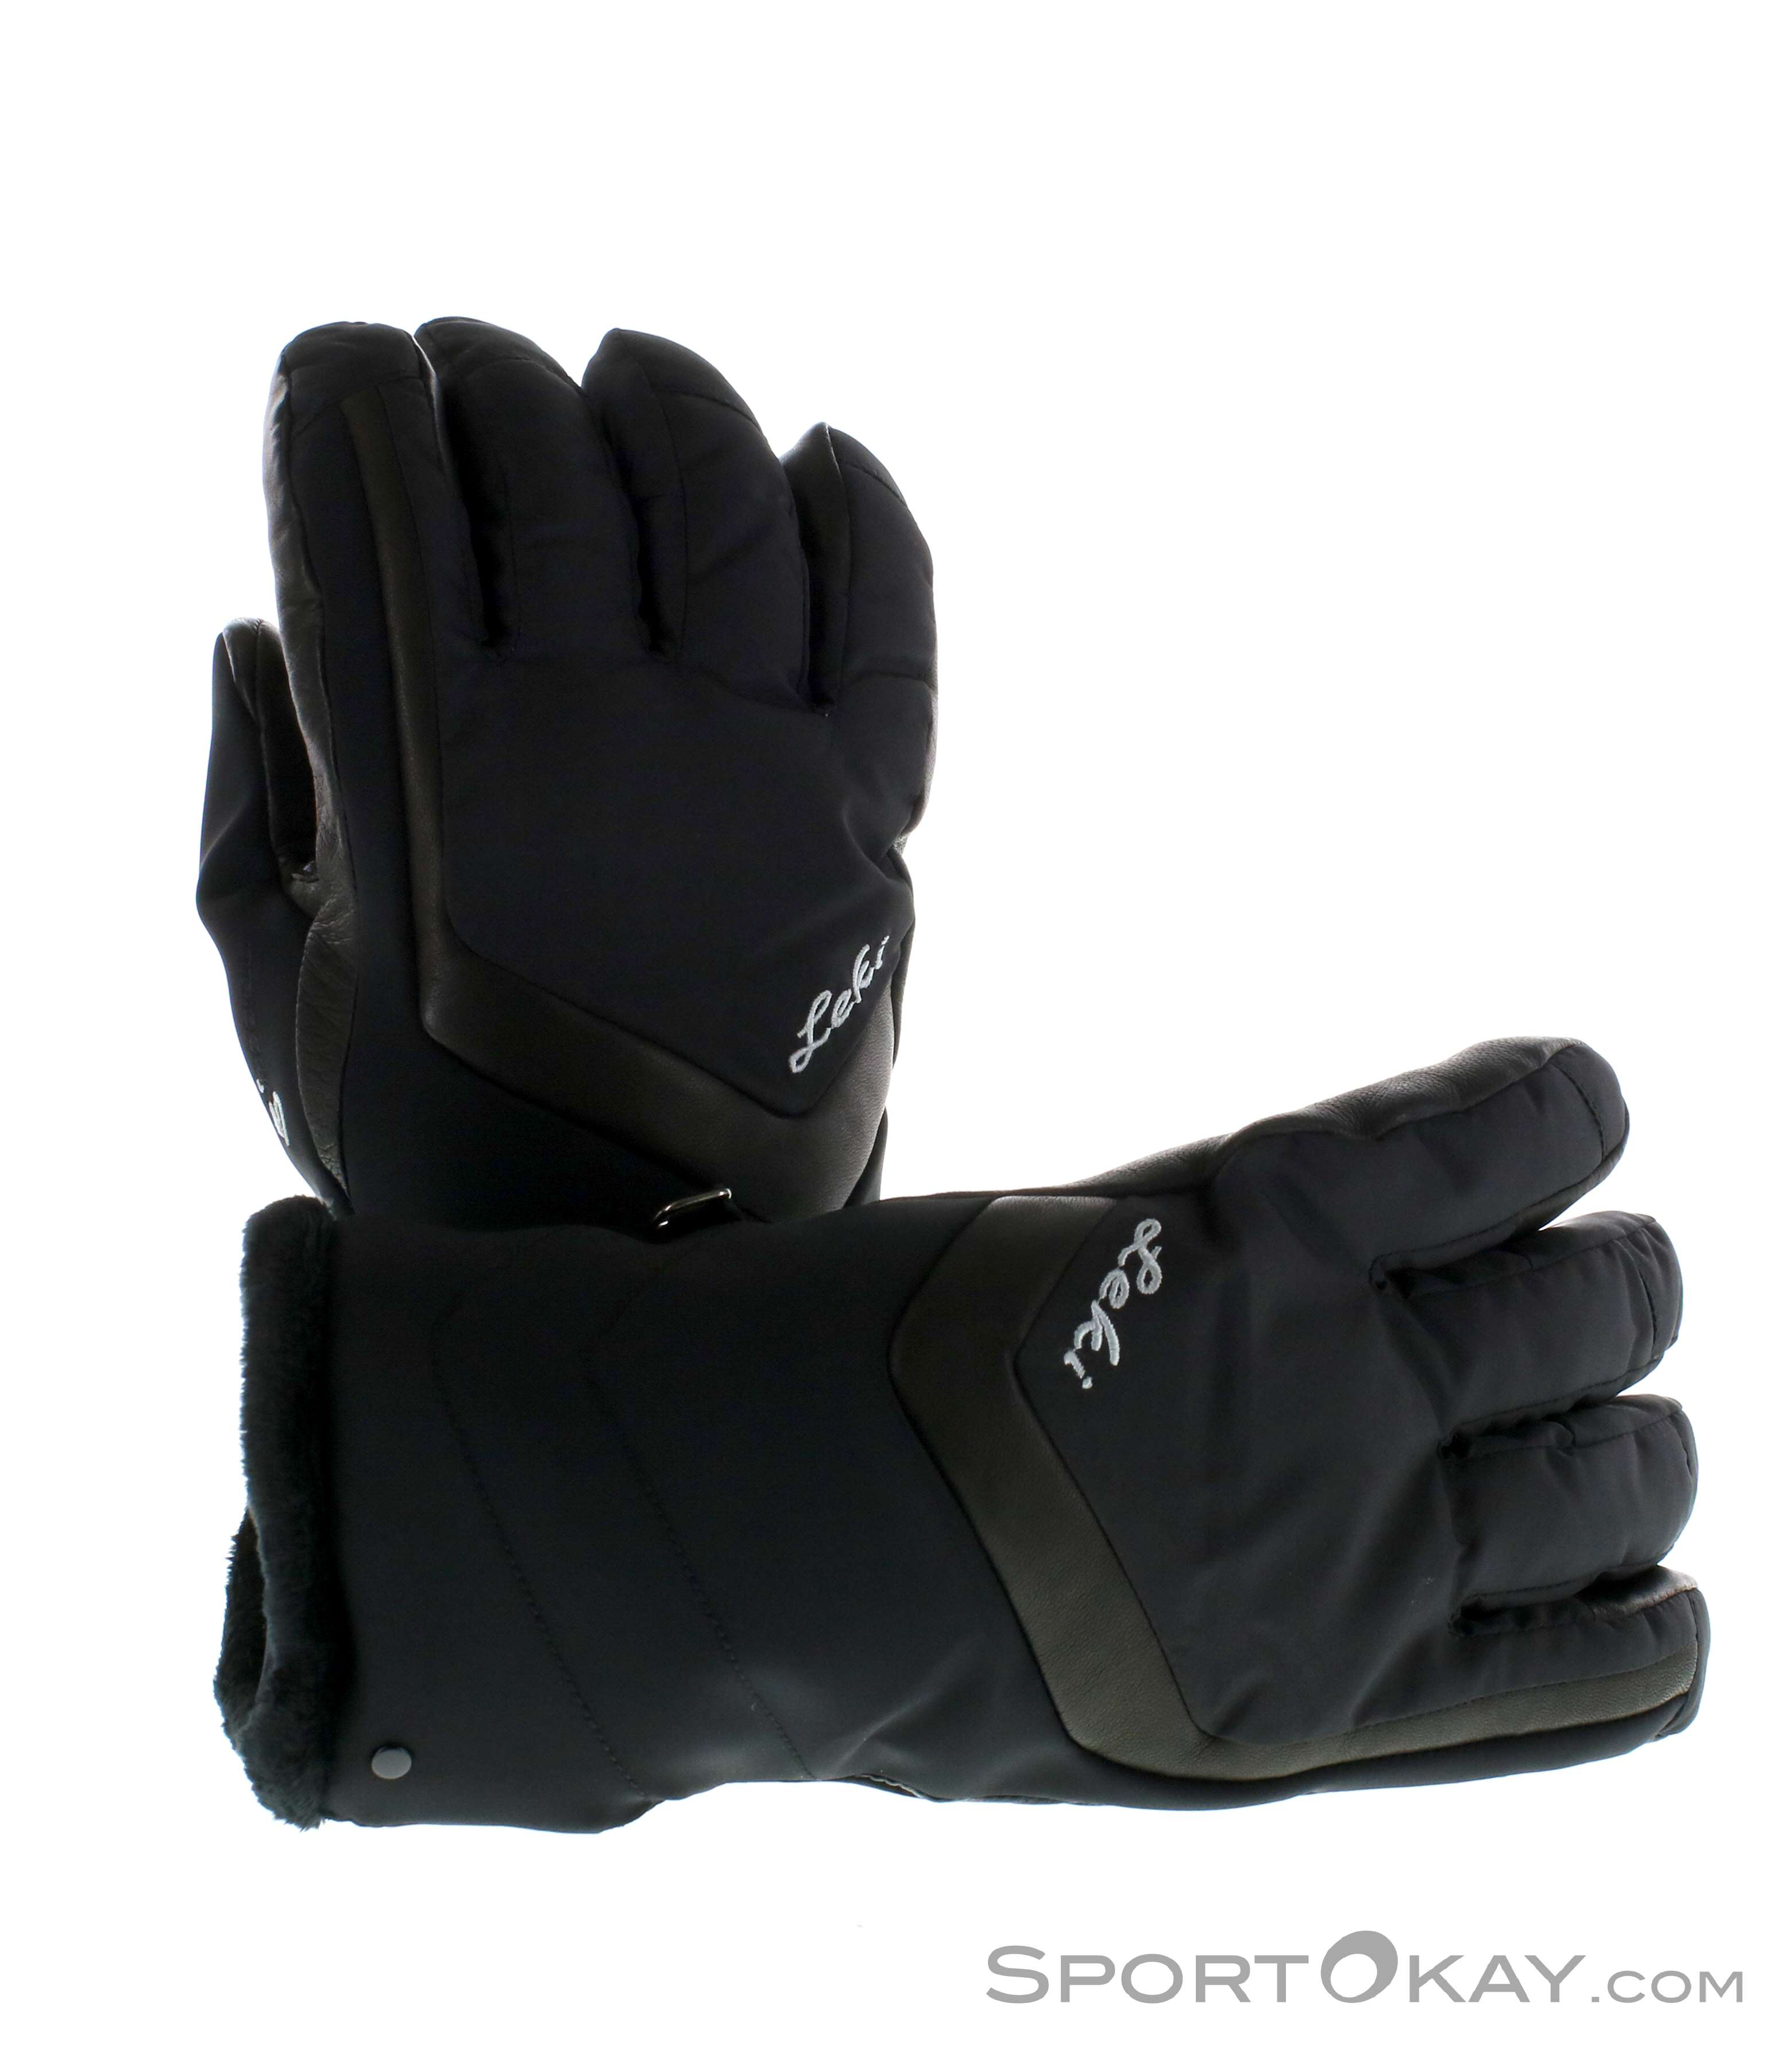 6d33ff076c8cf2 Leki Stella S Lady Damen Handschuhe - Skihandschuhe - Skibekleidung ...